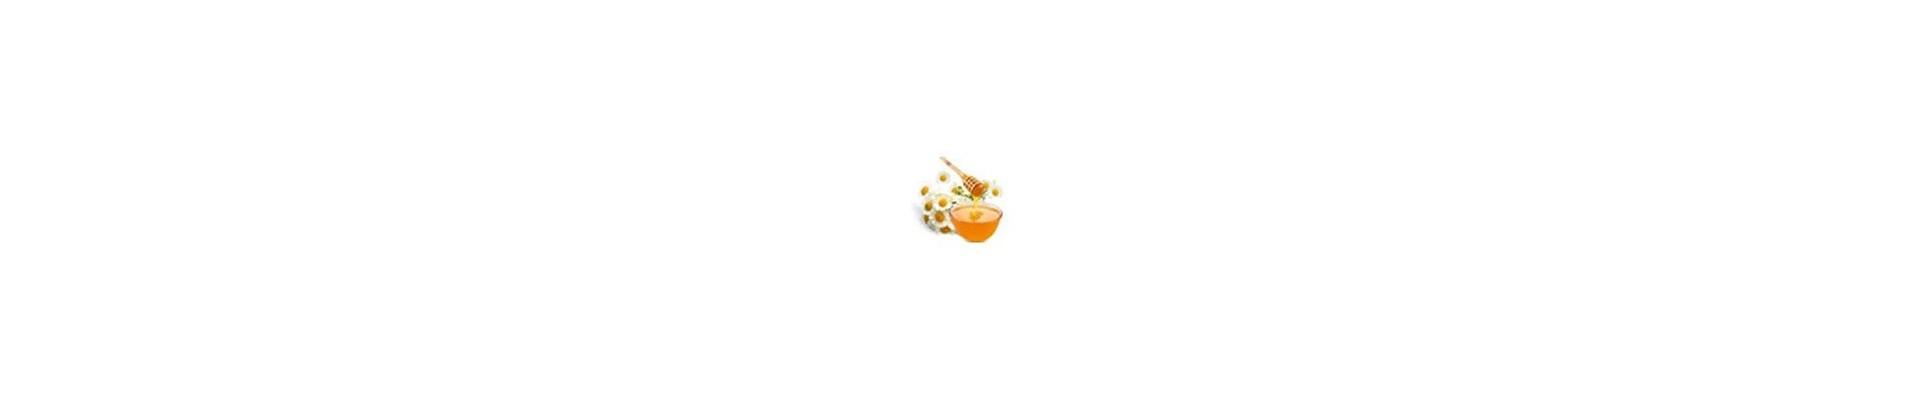 Online sales of Sicilian honey only